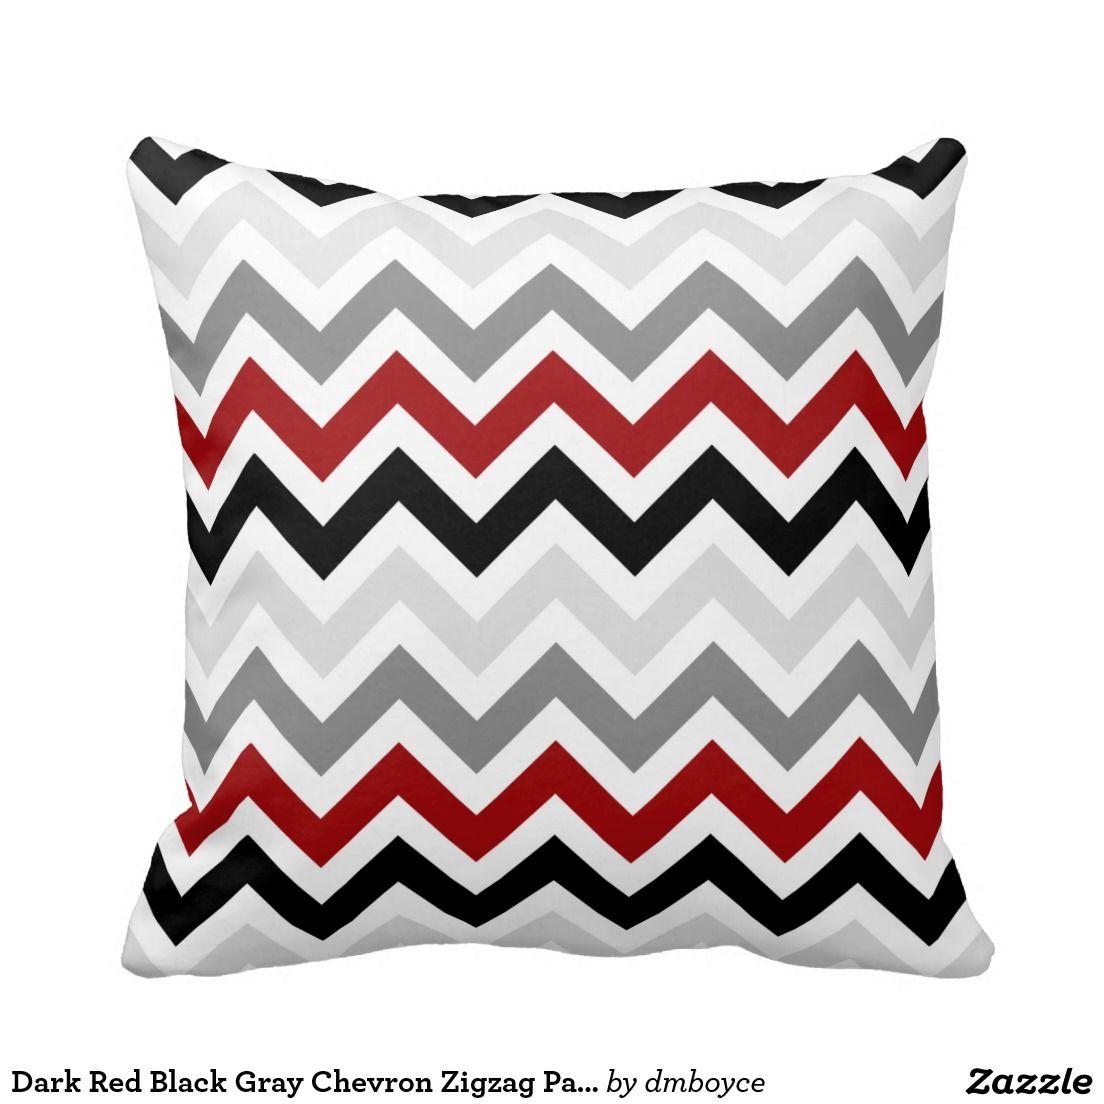 Brilliant Dark Red Black Gray Chevron Zigzag Pattern Throw Pillow Evergreenethics Interior Chair Design Evergreenethicsorg